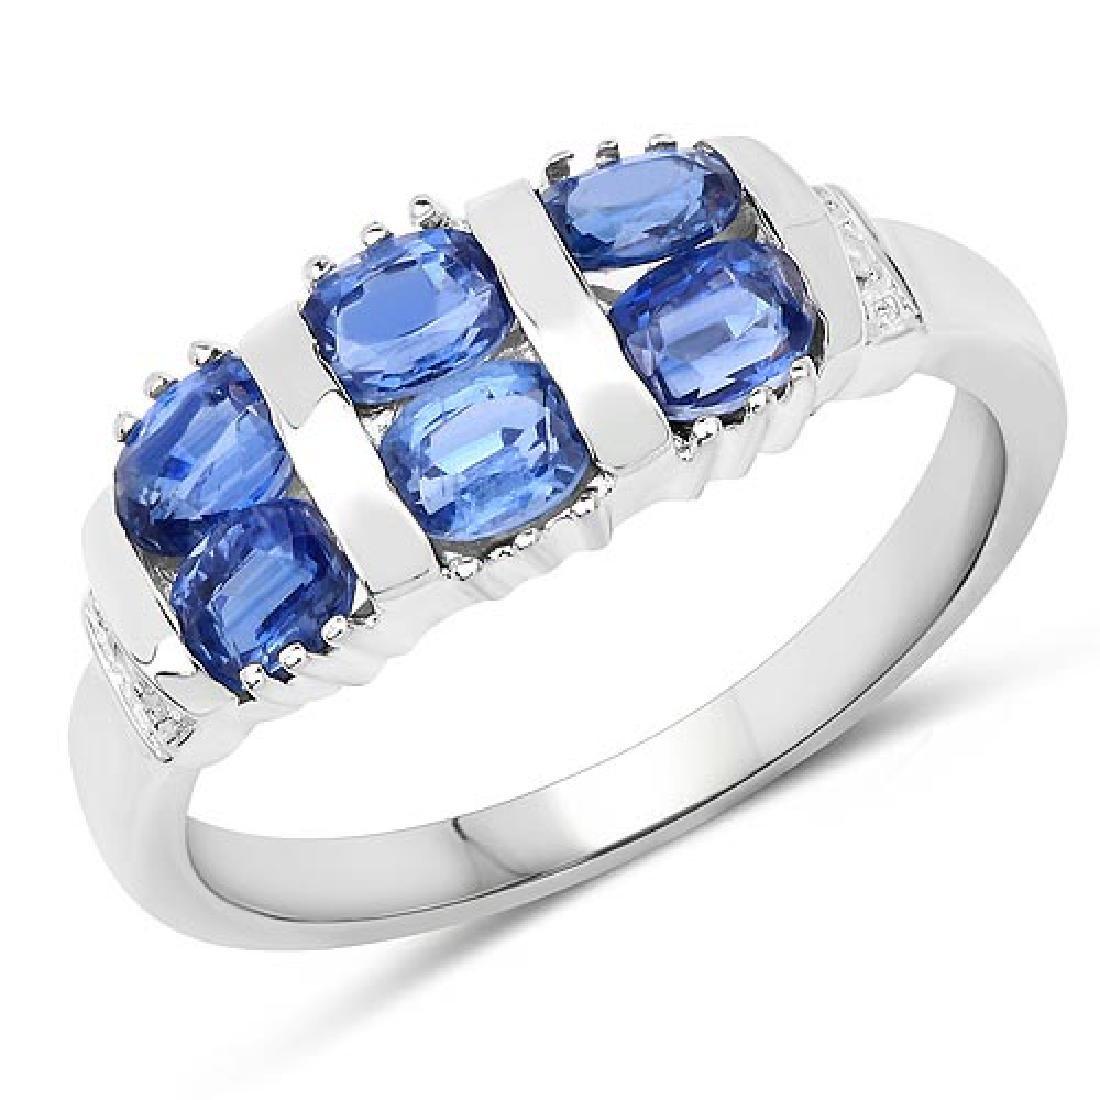 1.63 Carat Genuine Kyanite and White Diamond .925 Sterl